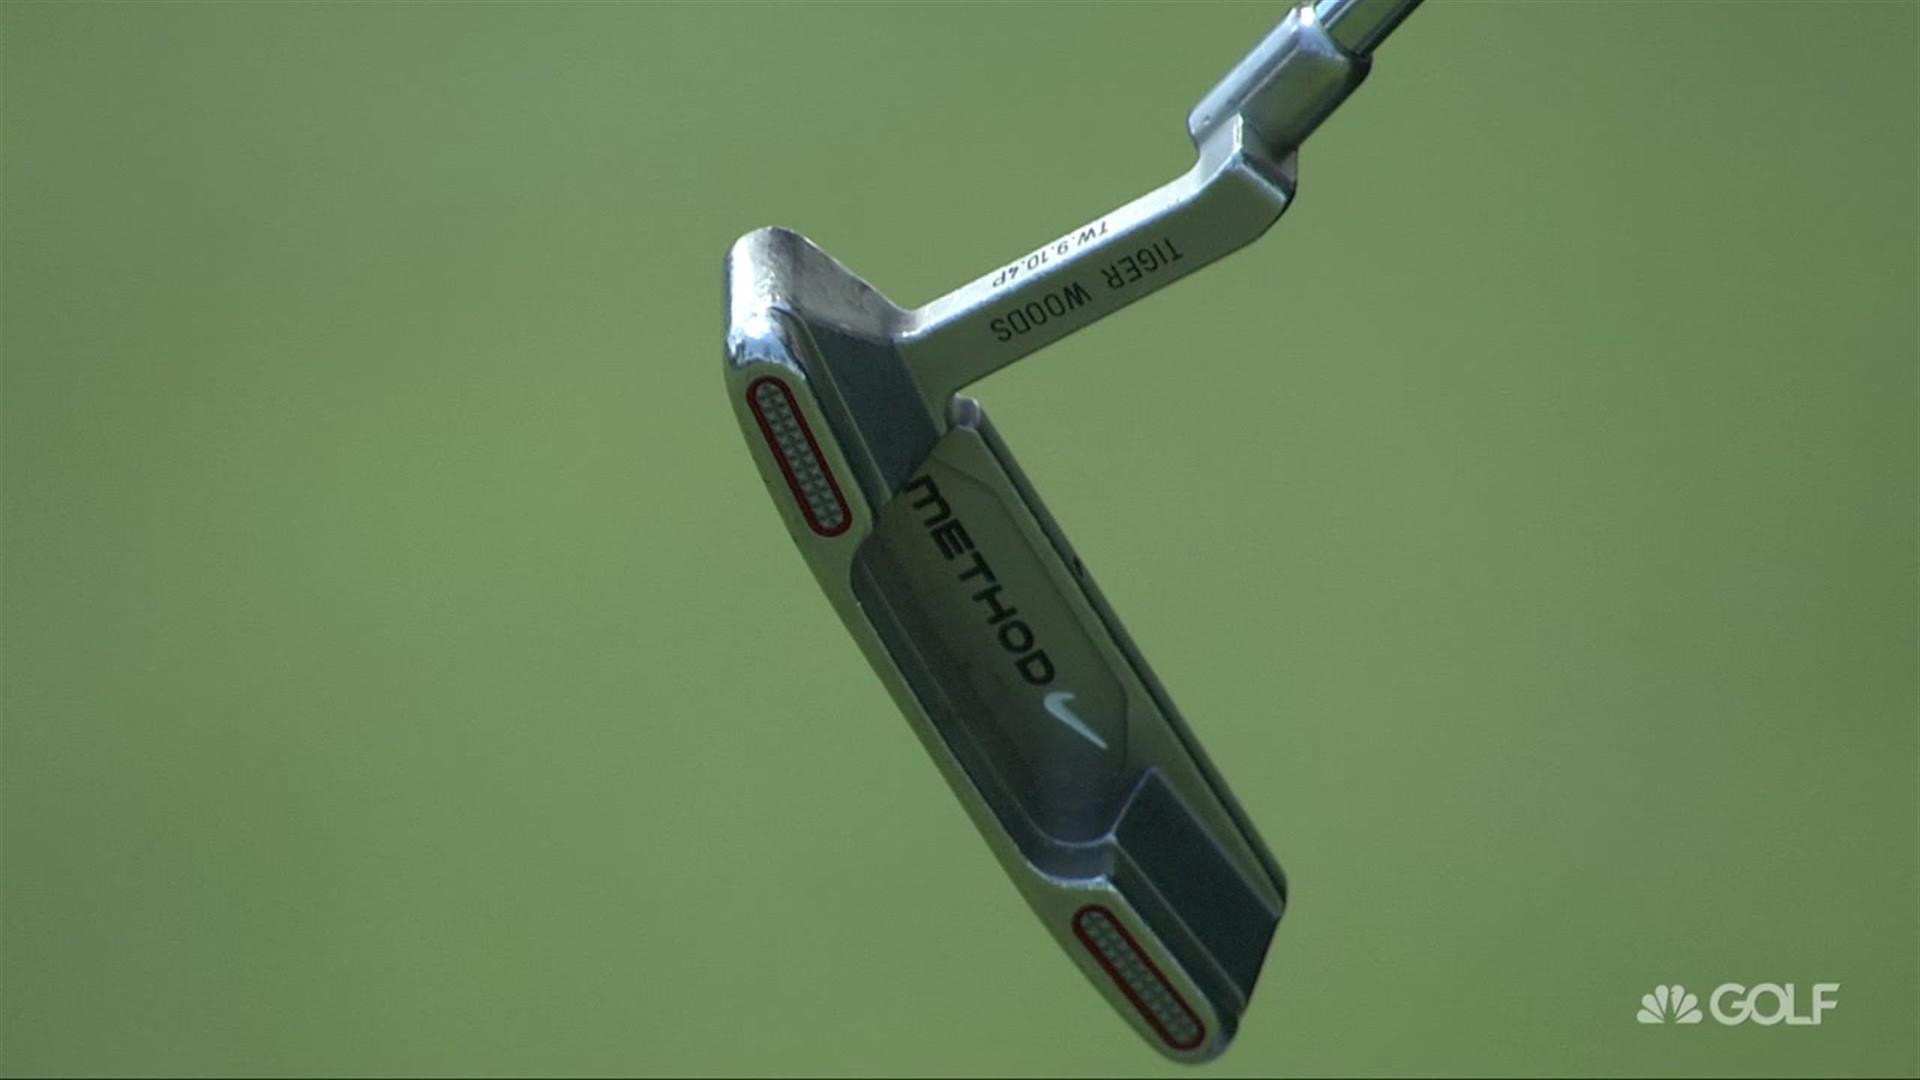 http://golfchannel.akamaized.net/ramp/414/790/0kN7PNFMBk_qdtuDYZMg4WD55xQh54gC_1531600651950_1920x1080_1277124675517.jpg